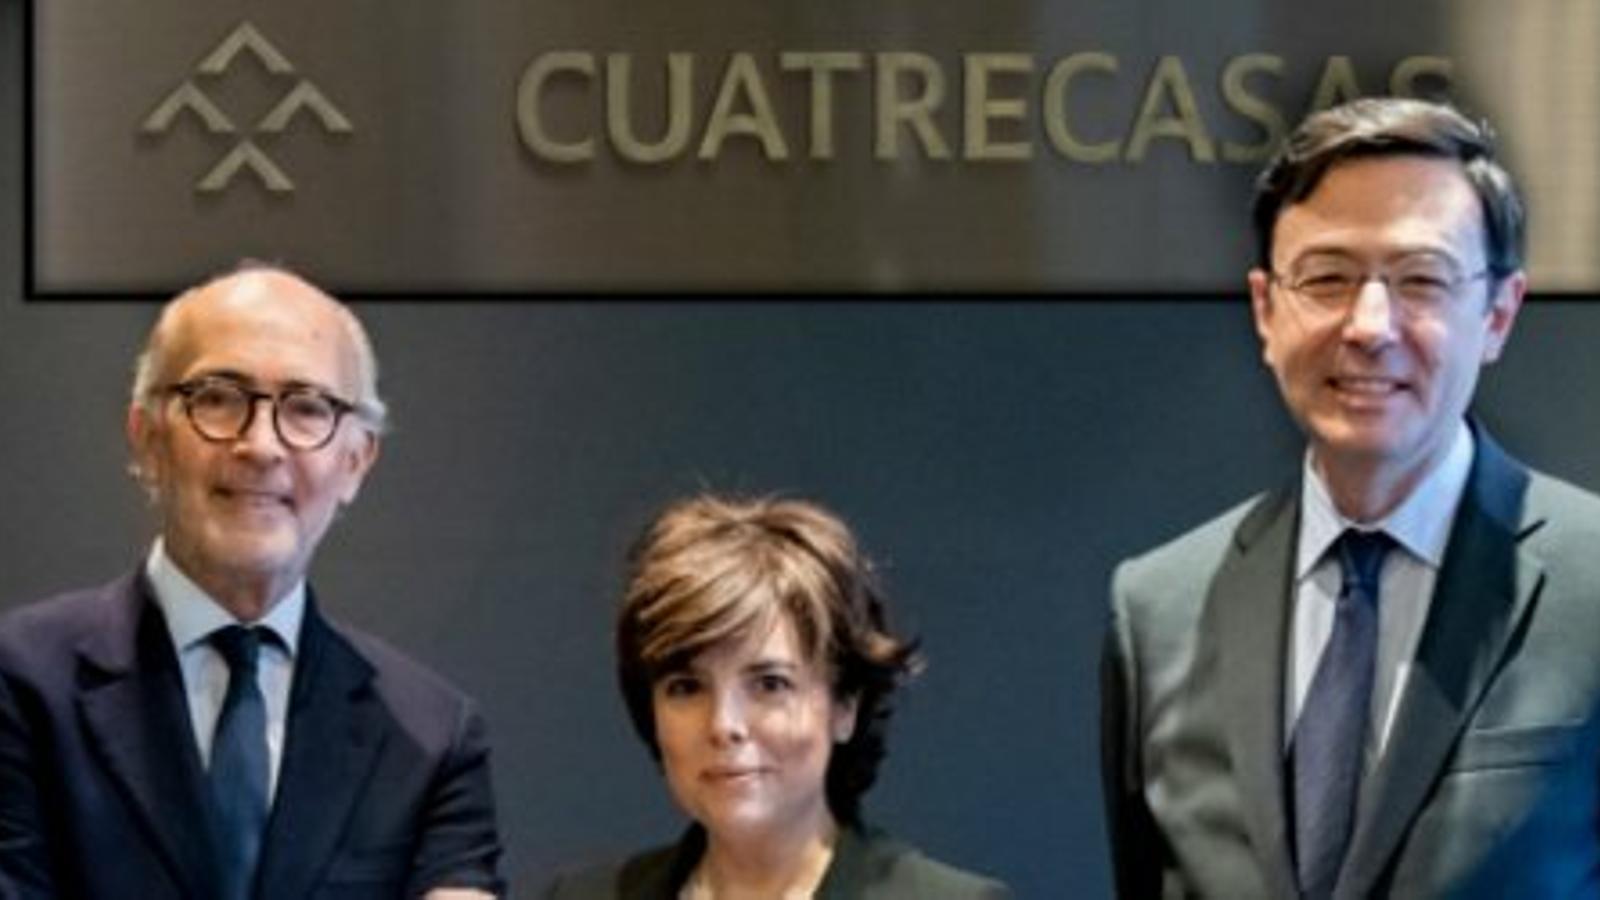 Sáenz de Santamaría fitxa pel bufet d'advocats barceloní Cuatrecasas